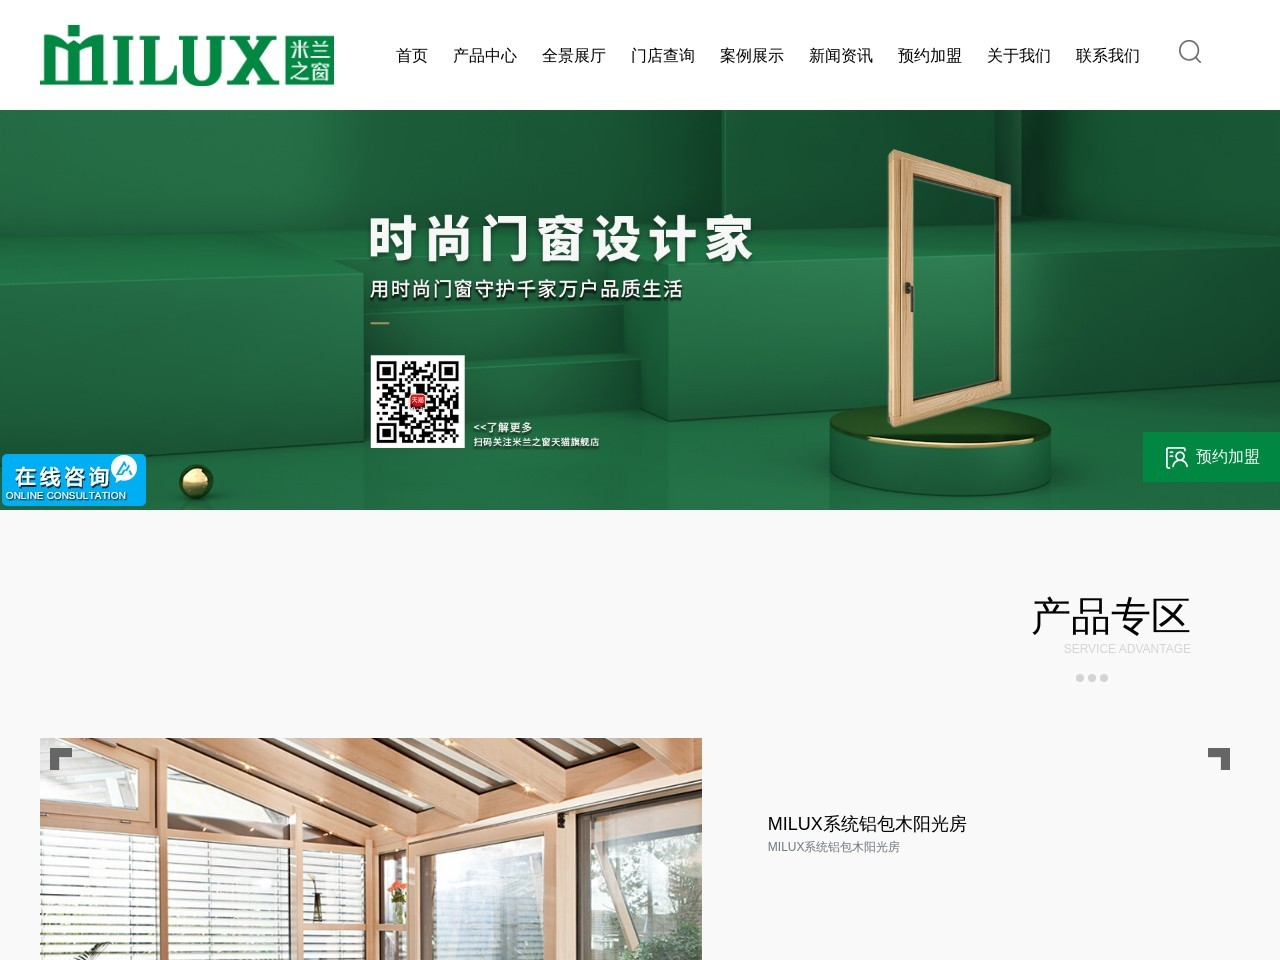 米兰之窗(www.miluxwindows.com)